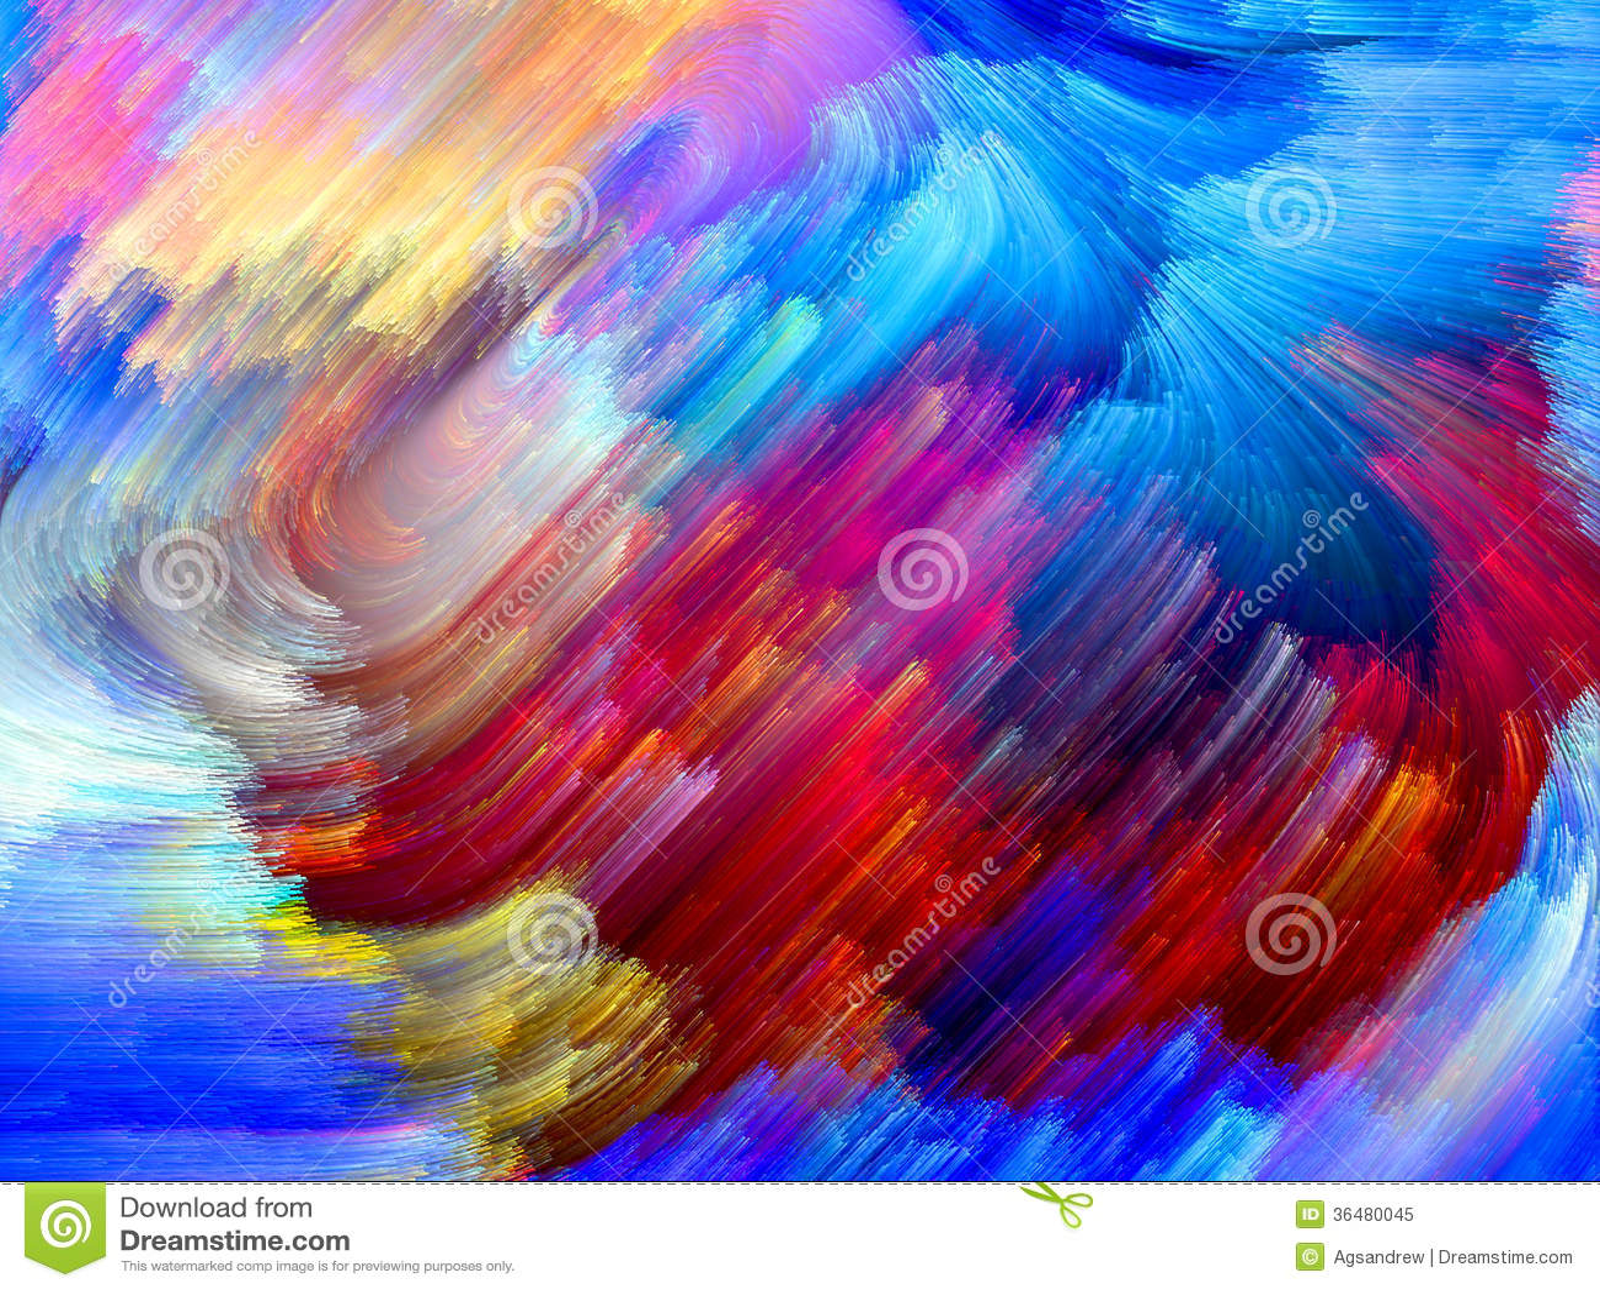 Colorful Energy Royalty Free Stock Photo Image 36480045